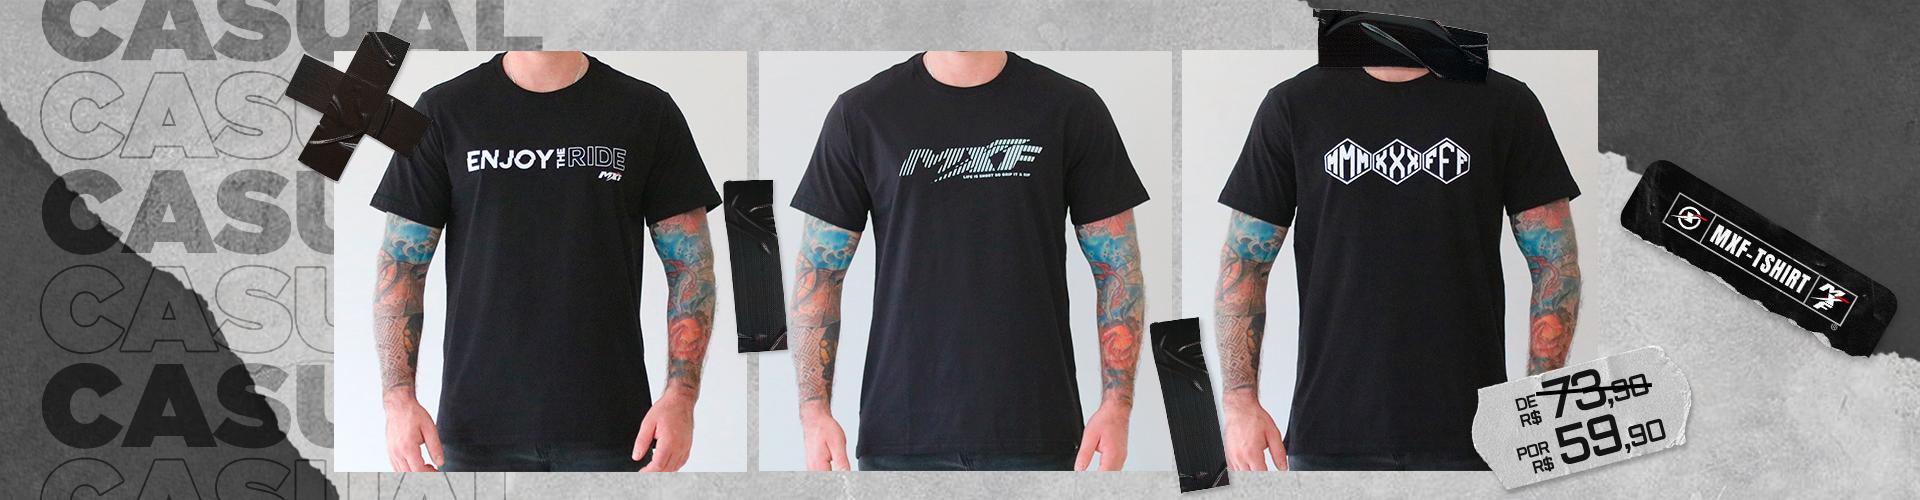 banner 1 - camisetas